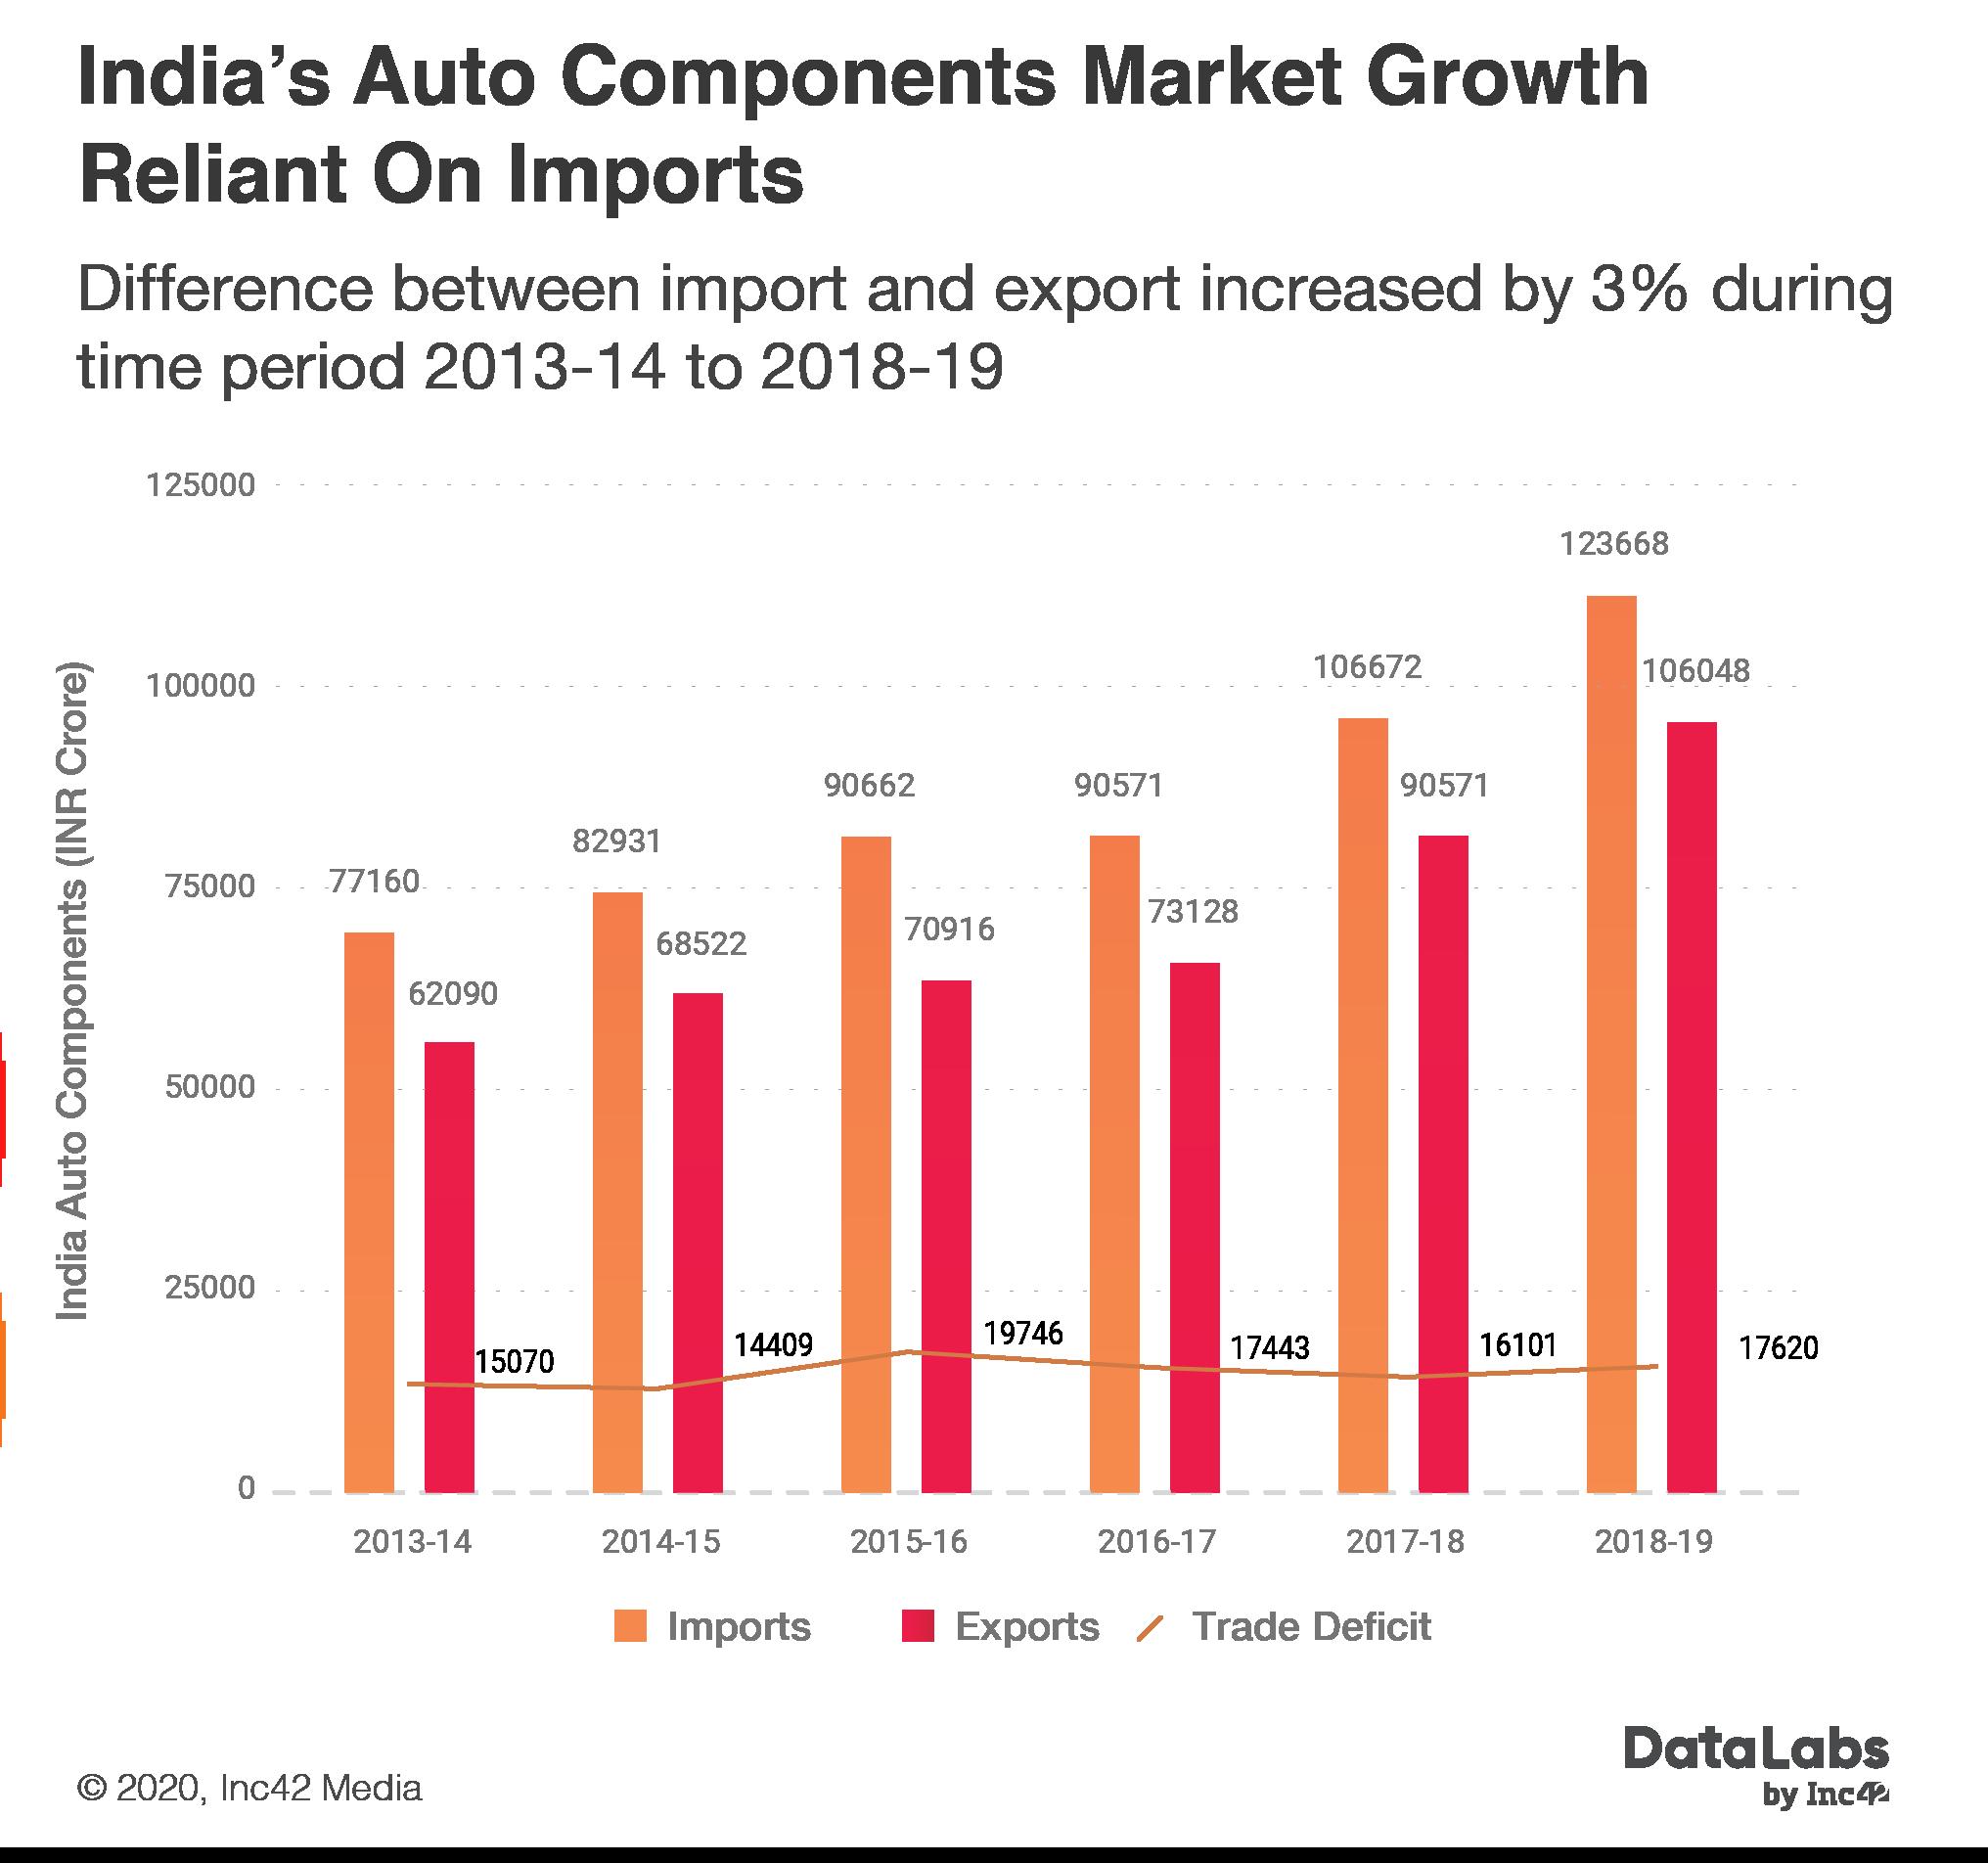 India's auto component market